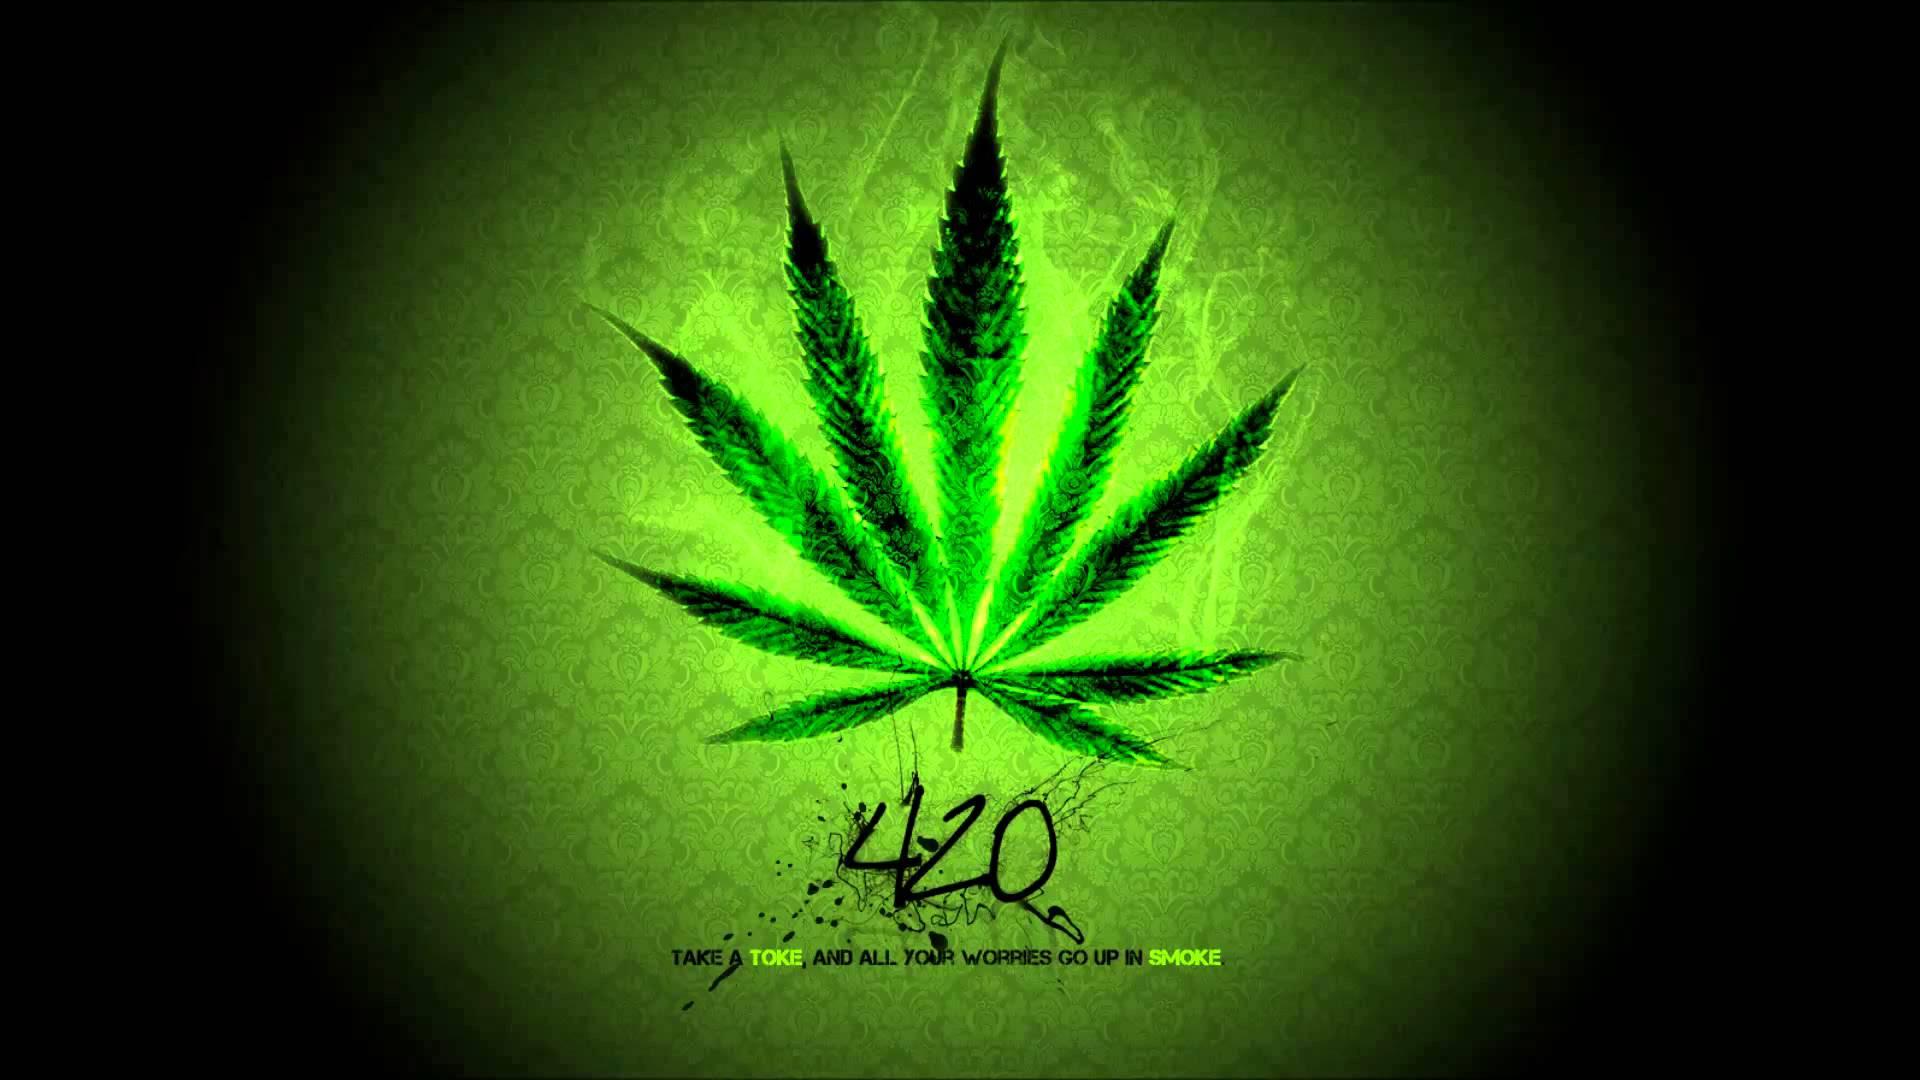 Weed Smoke Wallpaper Hd Trippy Weed Wallpaper Hd Weed Wallpaper 1920x1080